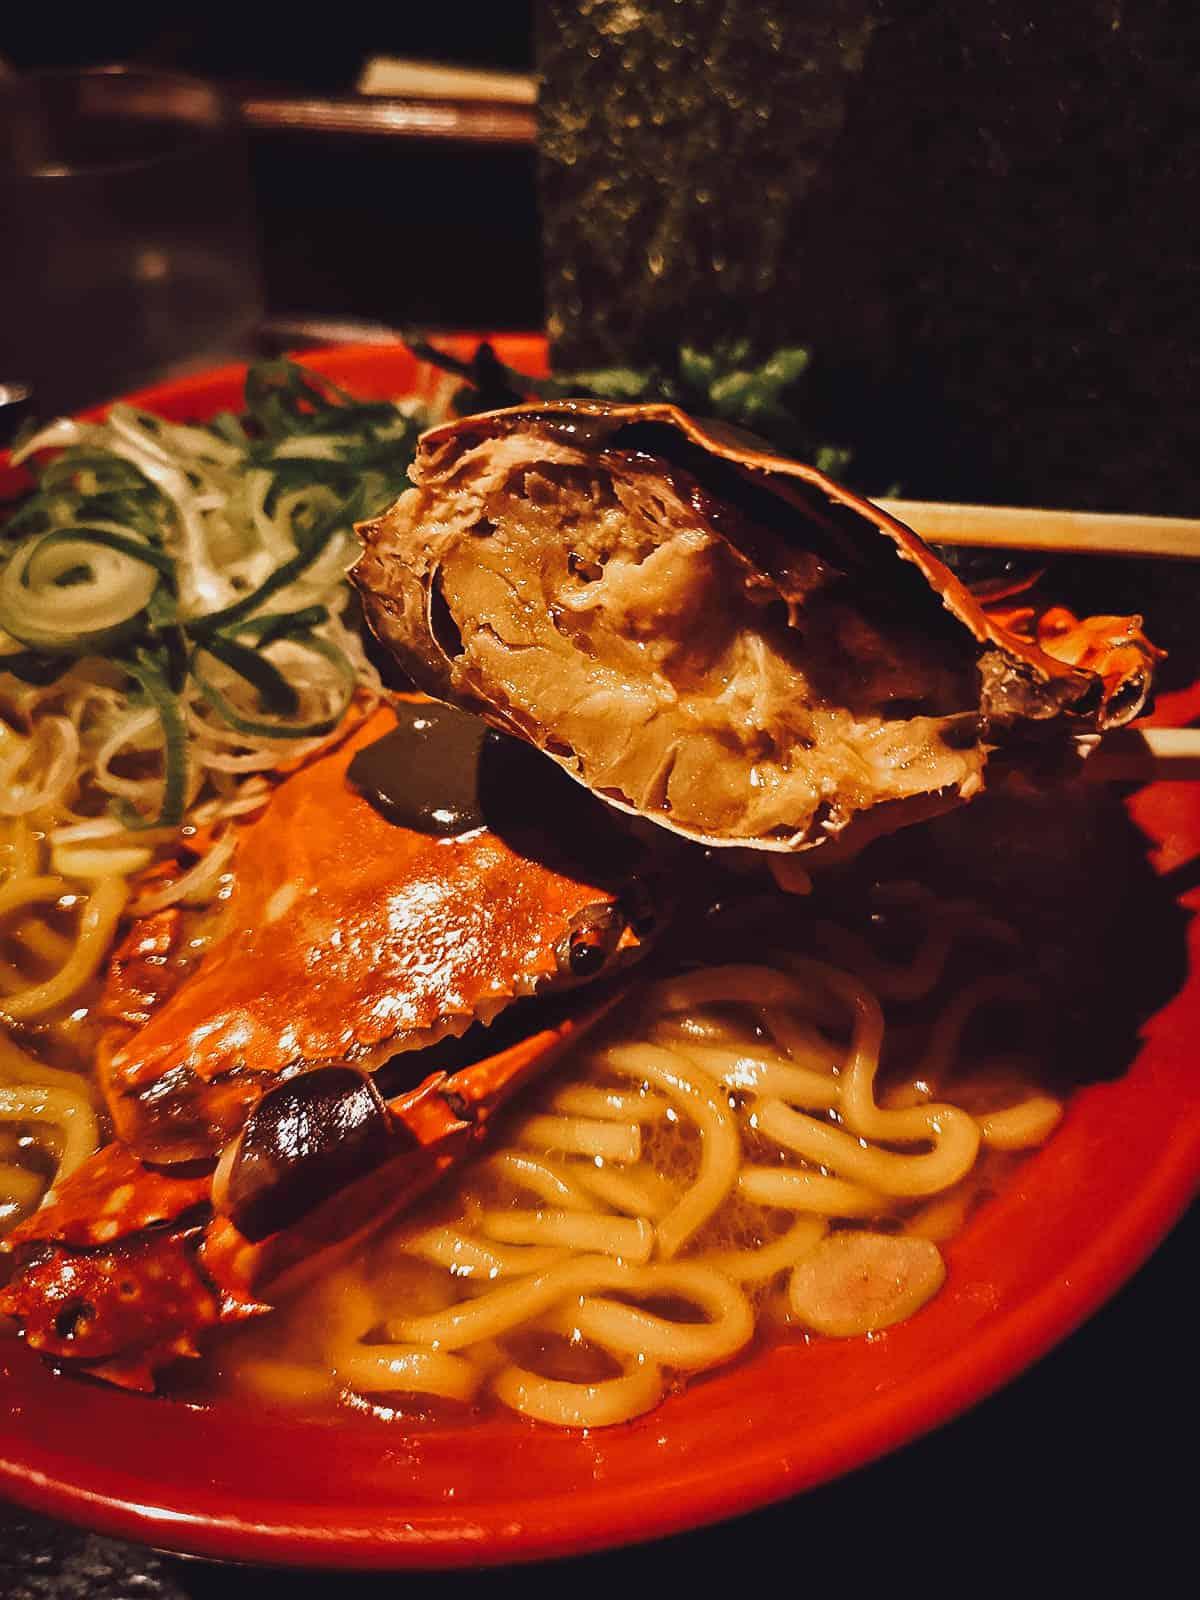 Crab miso ramen at 麺処いのこ平和台店 in Tokyo, Japan